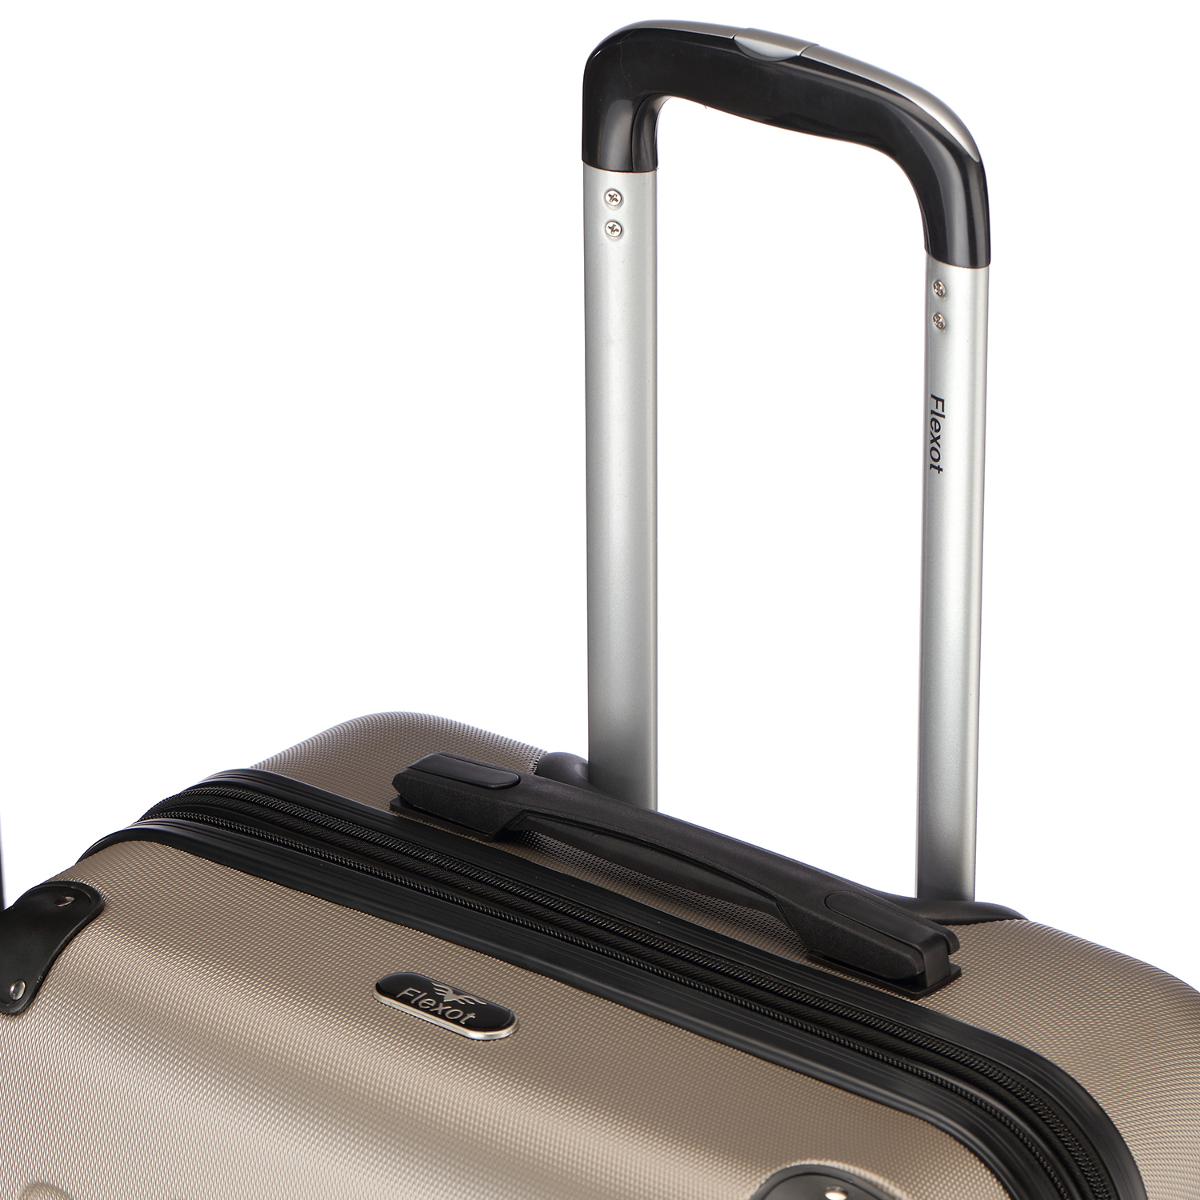 Koffer-Flexot-2045-Hartschalenkoffer-Trolley-Kofferset-Reisekoffer-M-L-XL-Set Indexbild 50